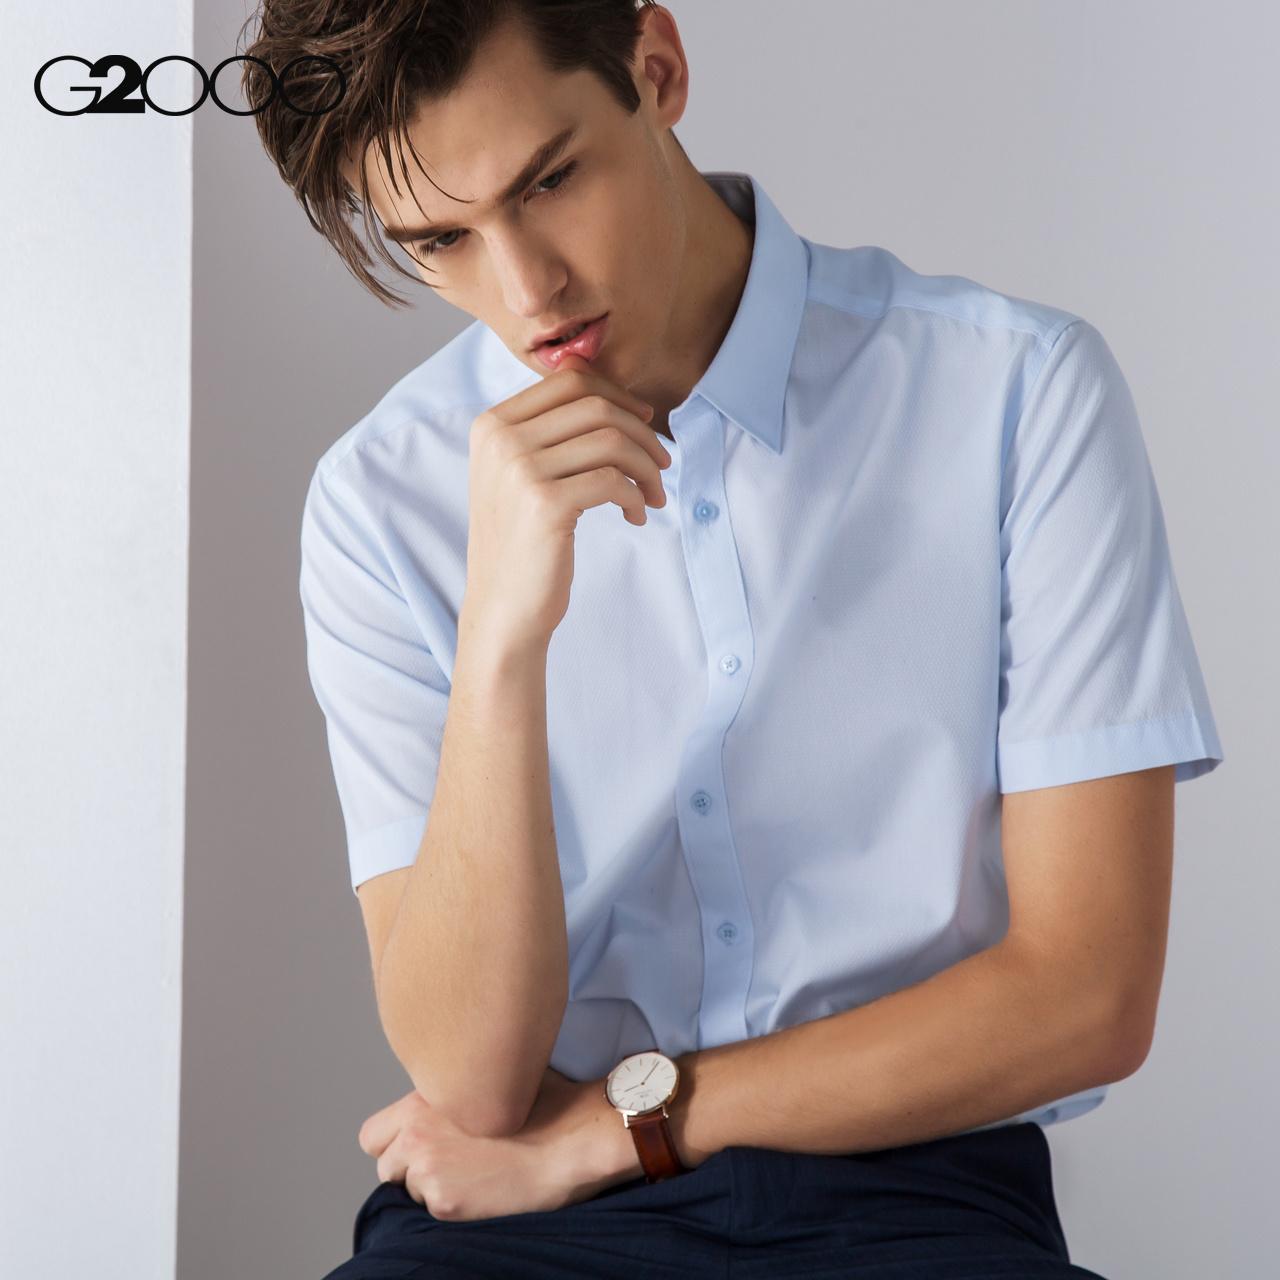 G2000男装修身尖领CVC面料短袖衬衫 商务青年正装男士休闲衬衣图片